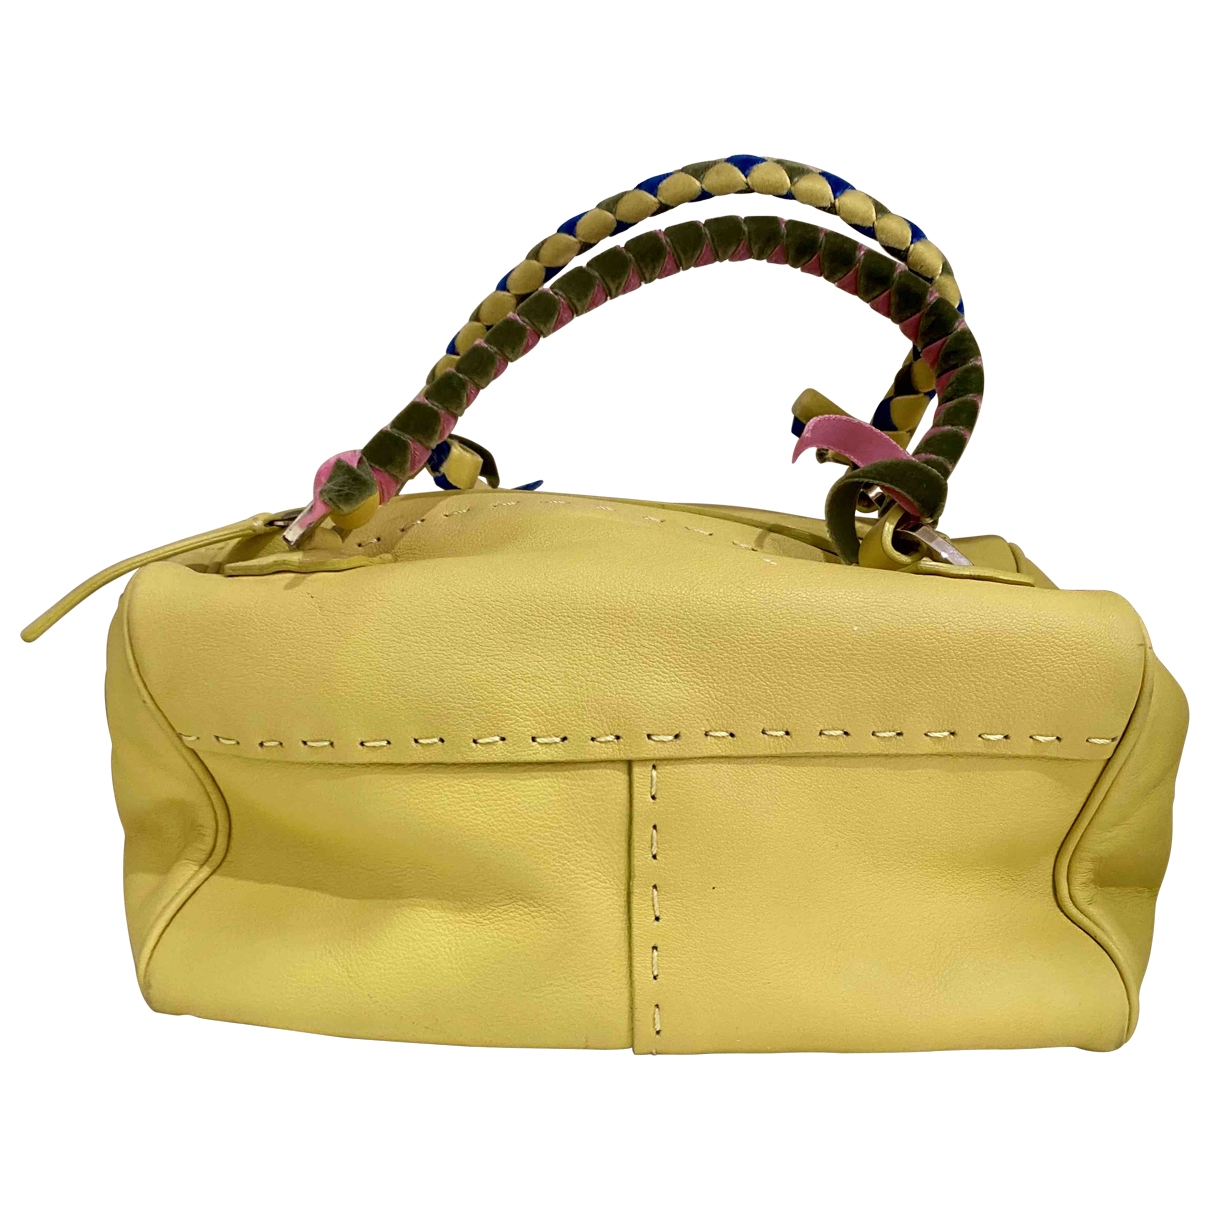 Malo \N Yellow Leather handbag for Women \N